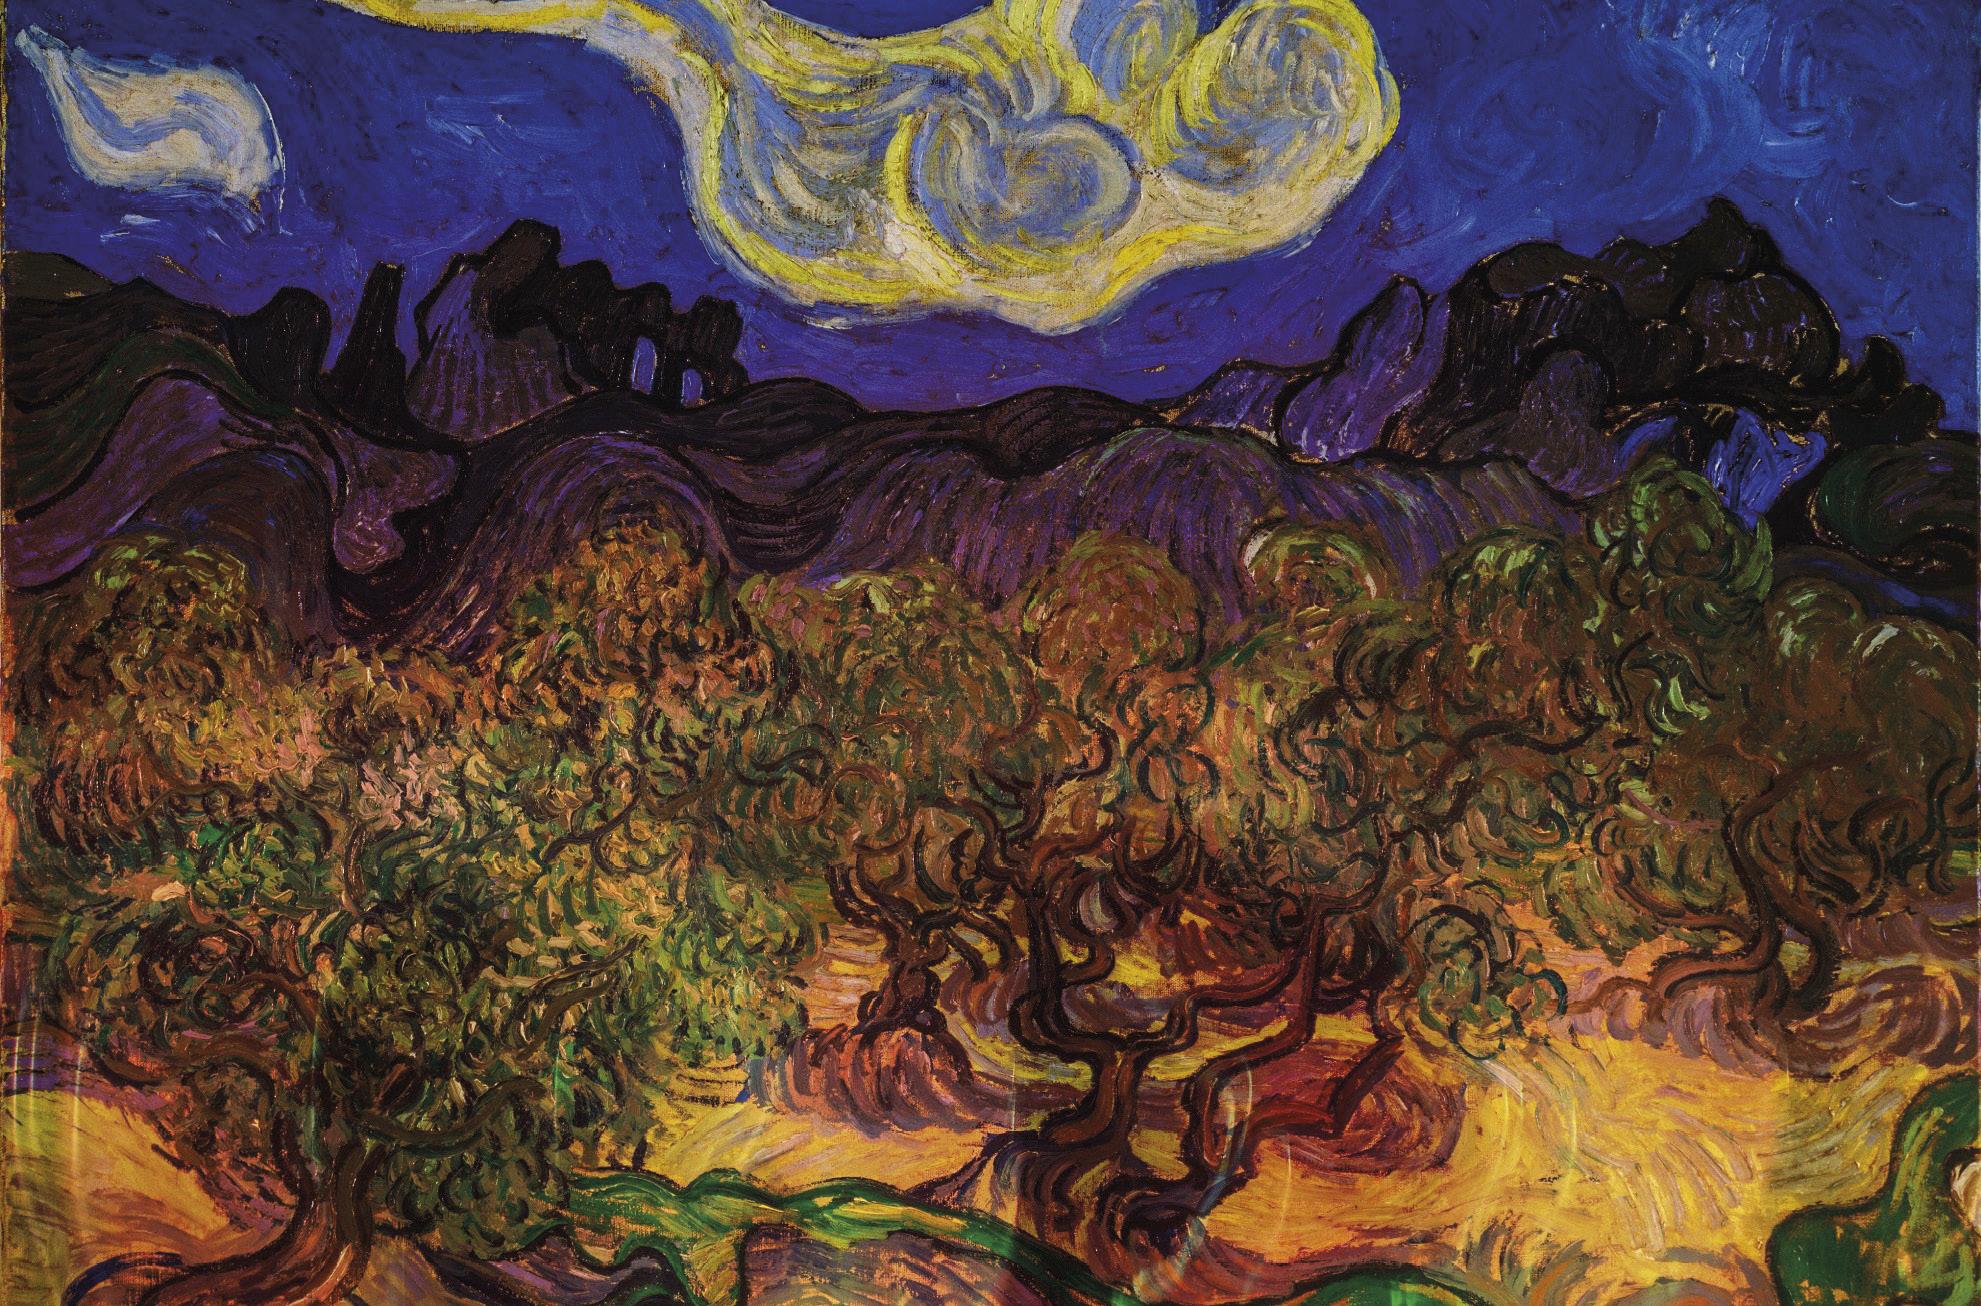 Oliveiras na noite, óleo sobre tela, van Gogh / Wikimedia Commons